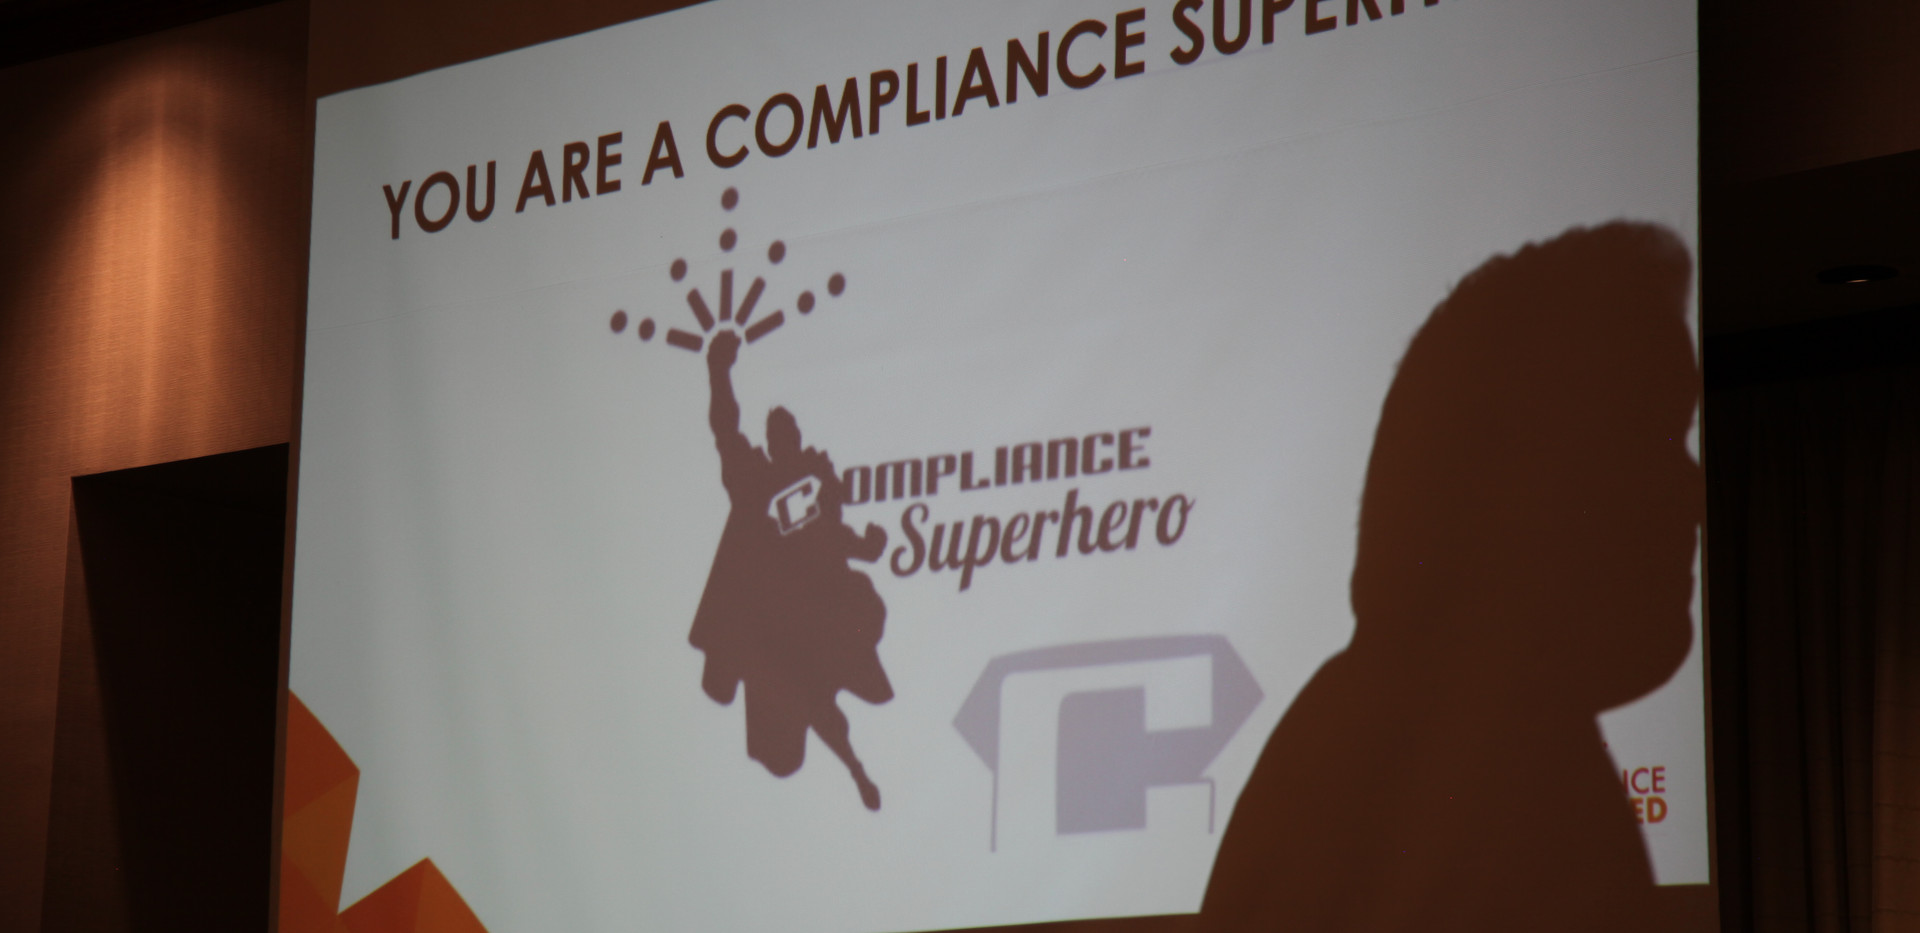 Compliance Superhero